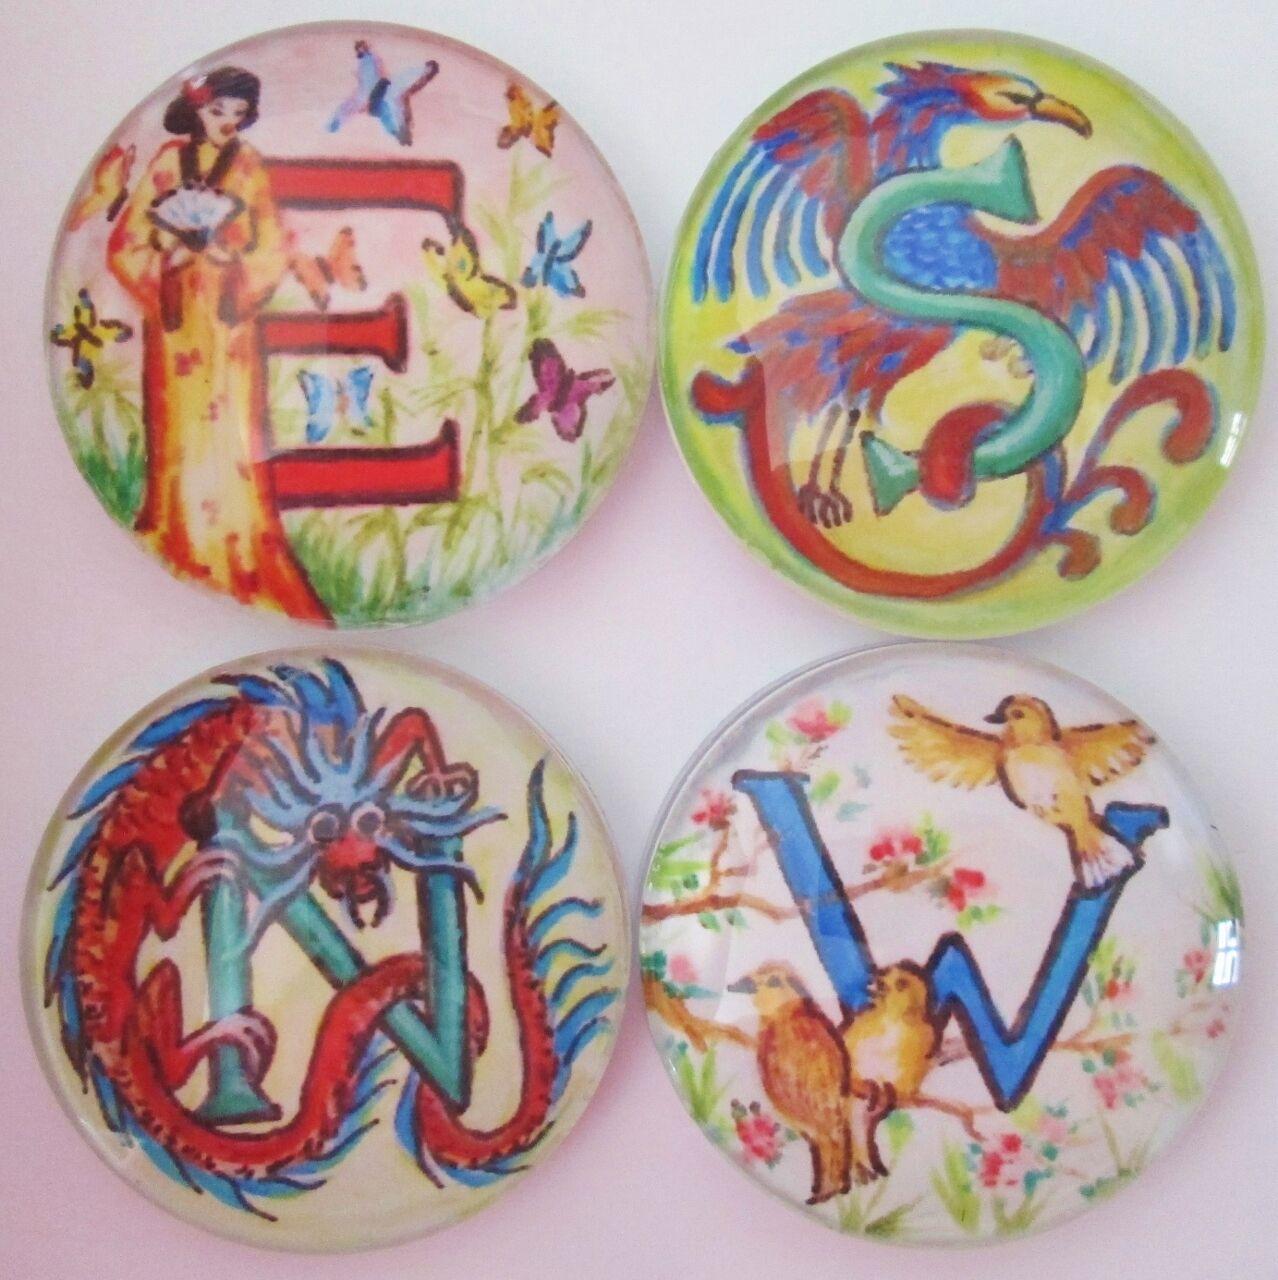 Wind Discs, Directional Indicators, Set of 4, E S W N Mahjong, Mah Jongg